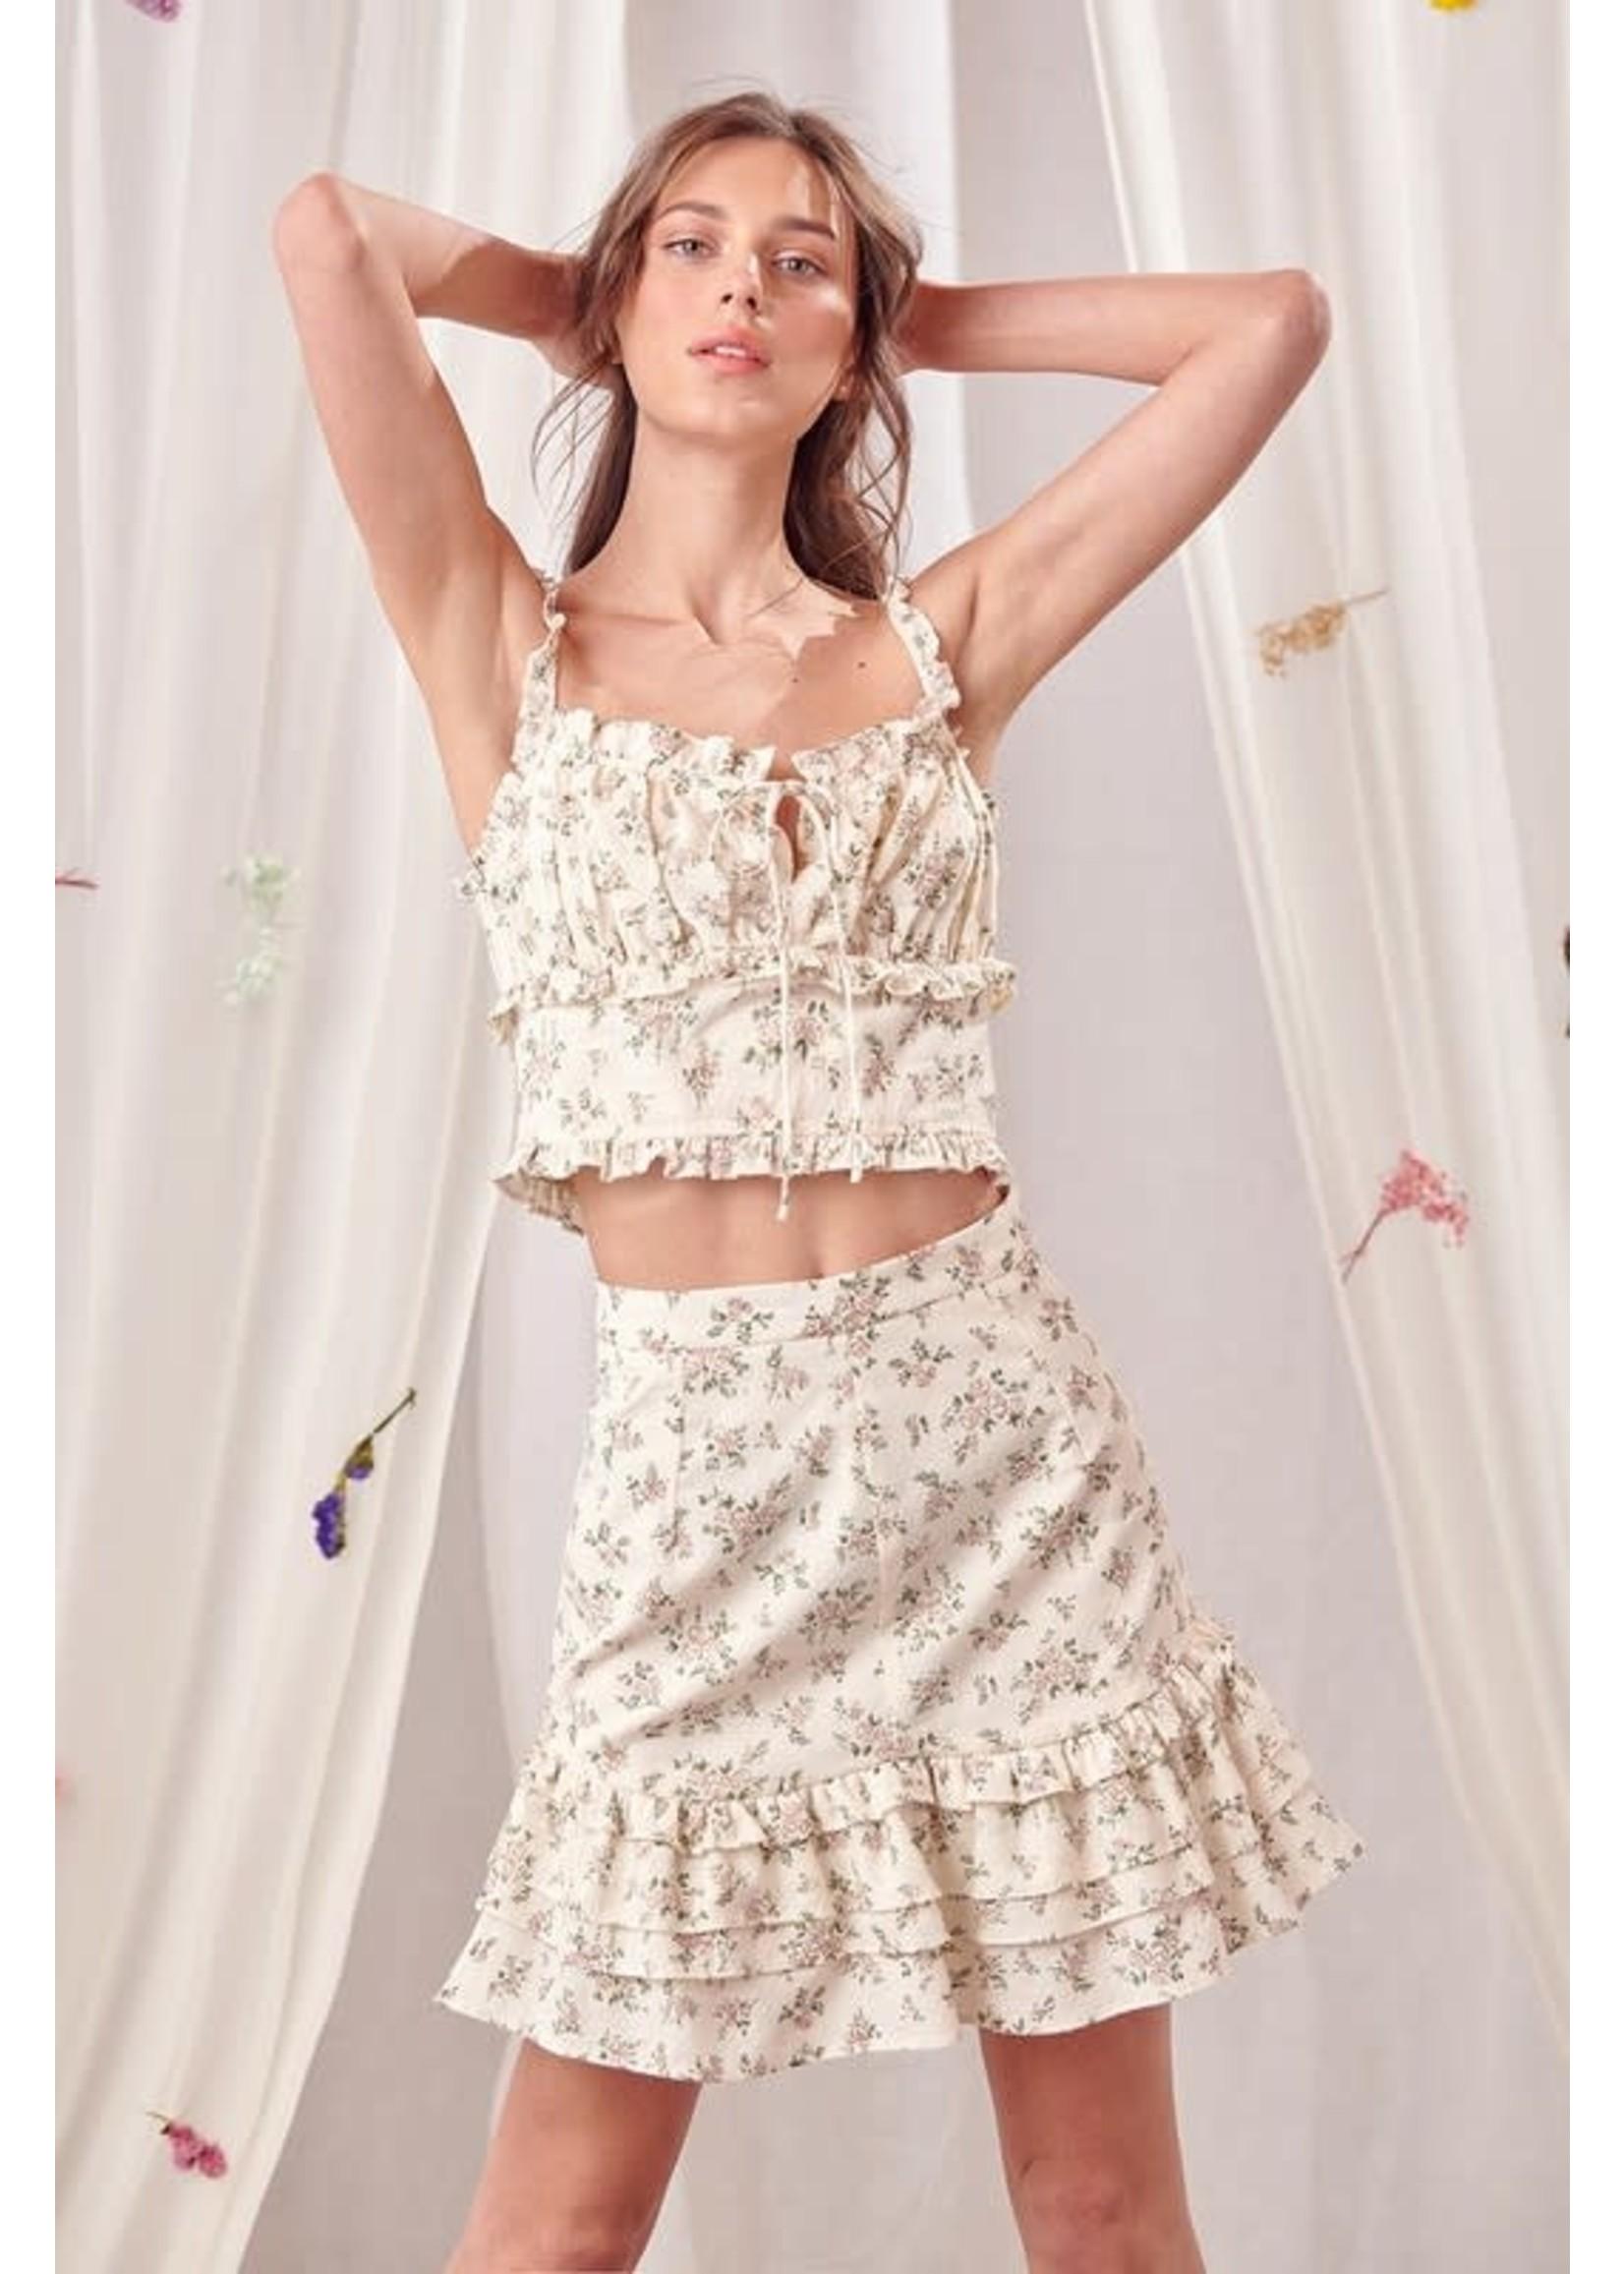 Storia Floral Mini Skirt - JS3216